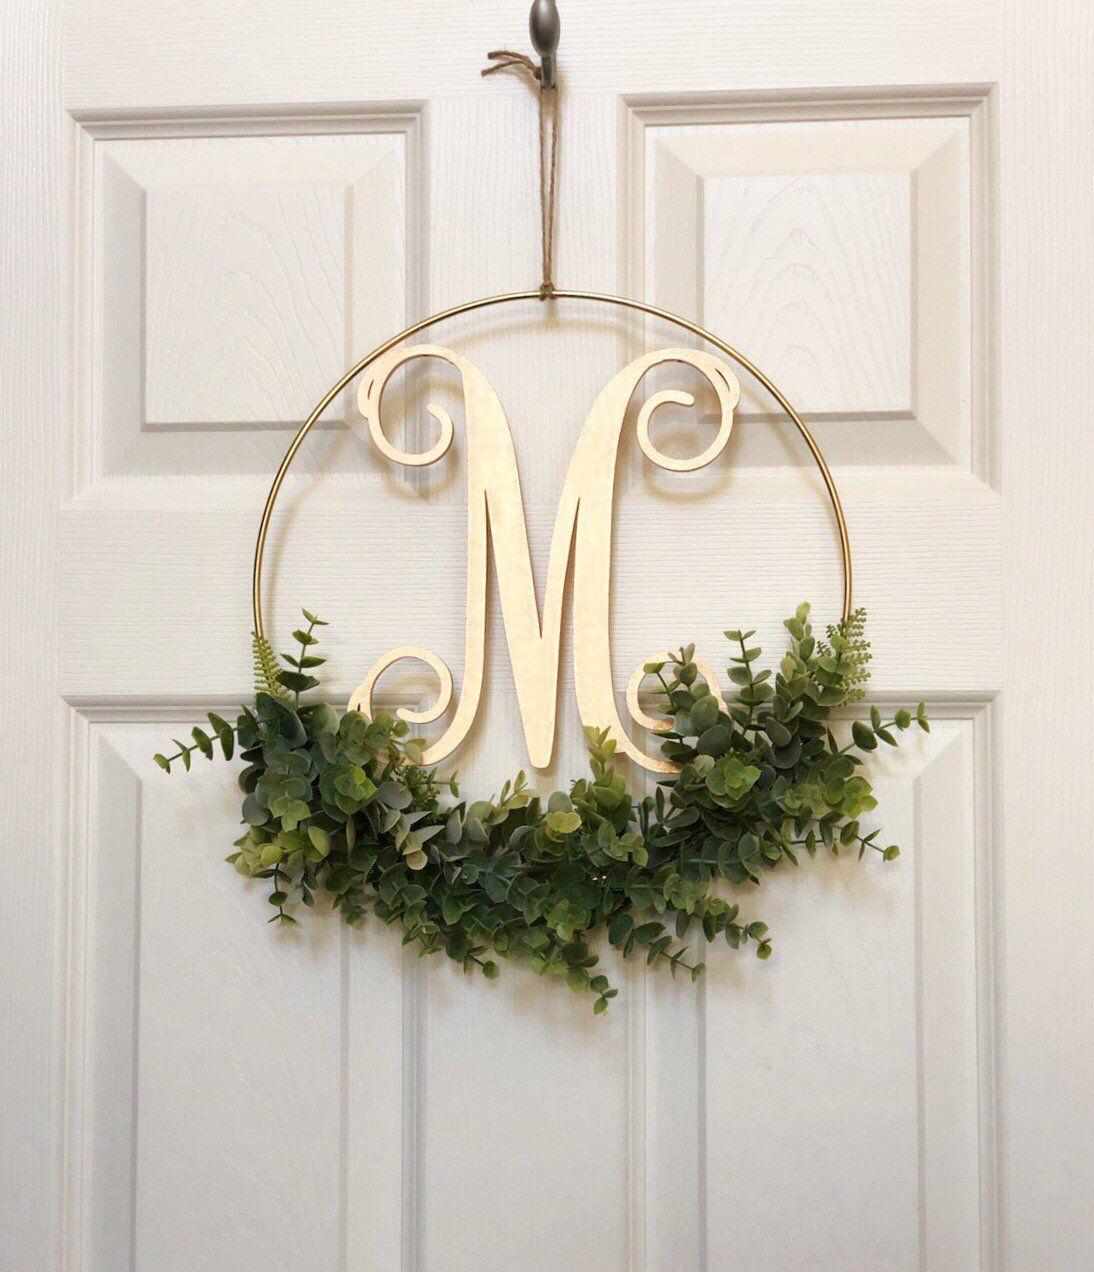 Photo of Modern Hoop 12″ Wreath – Artificial Eucalyptus Wreath – Modern Wreath with Initial – Letter Monogram Sign for Door – Farmhouse Hoop Wreath